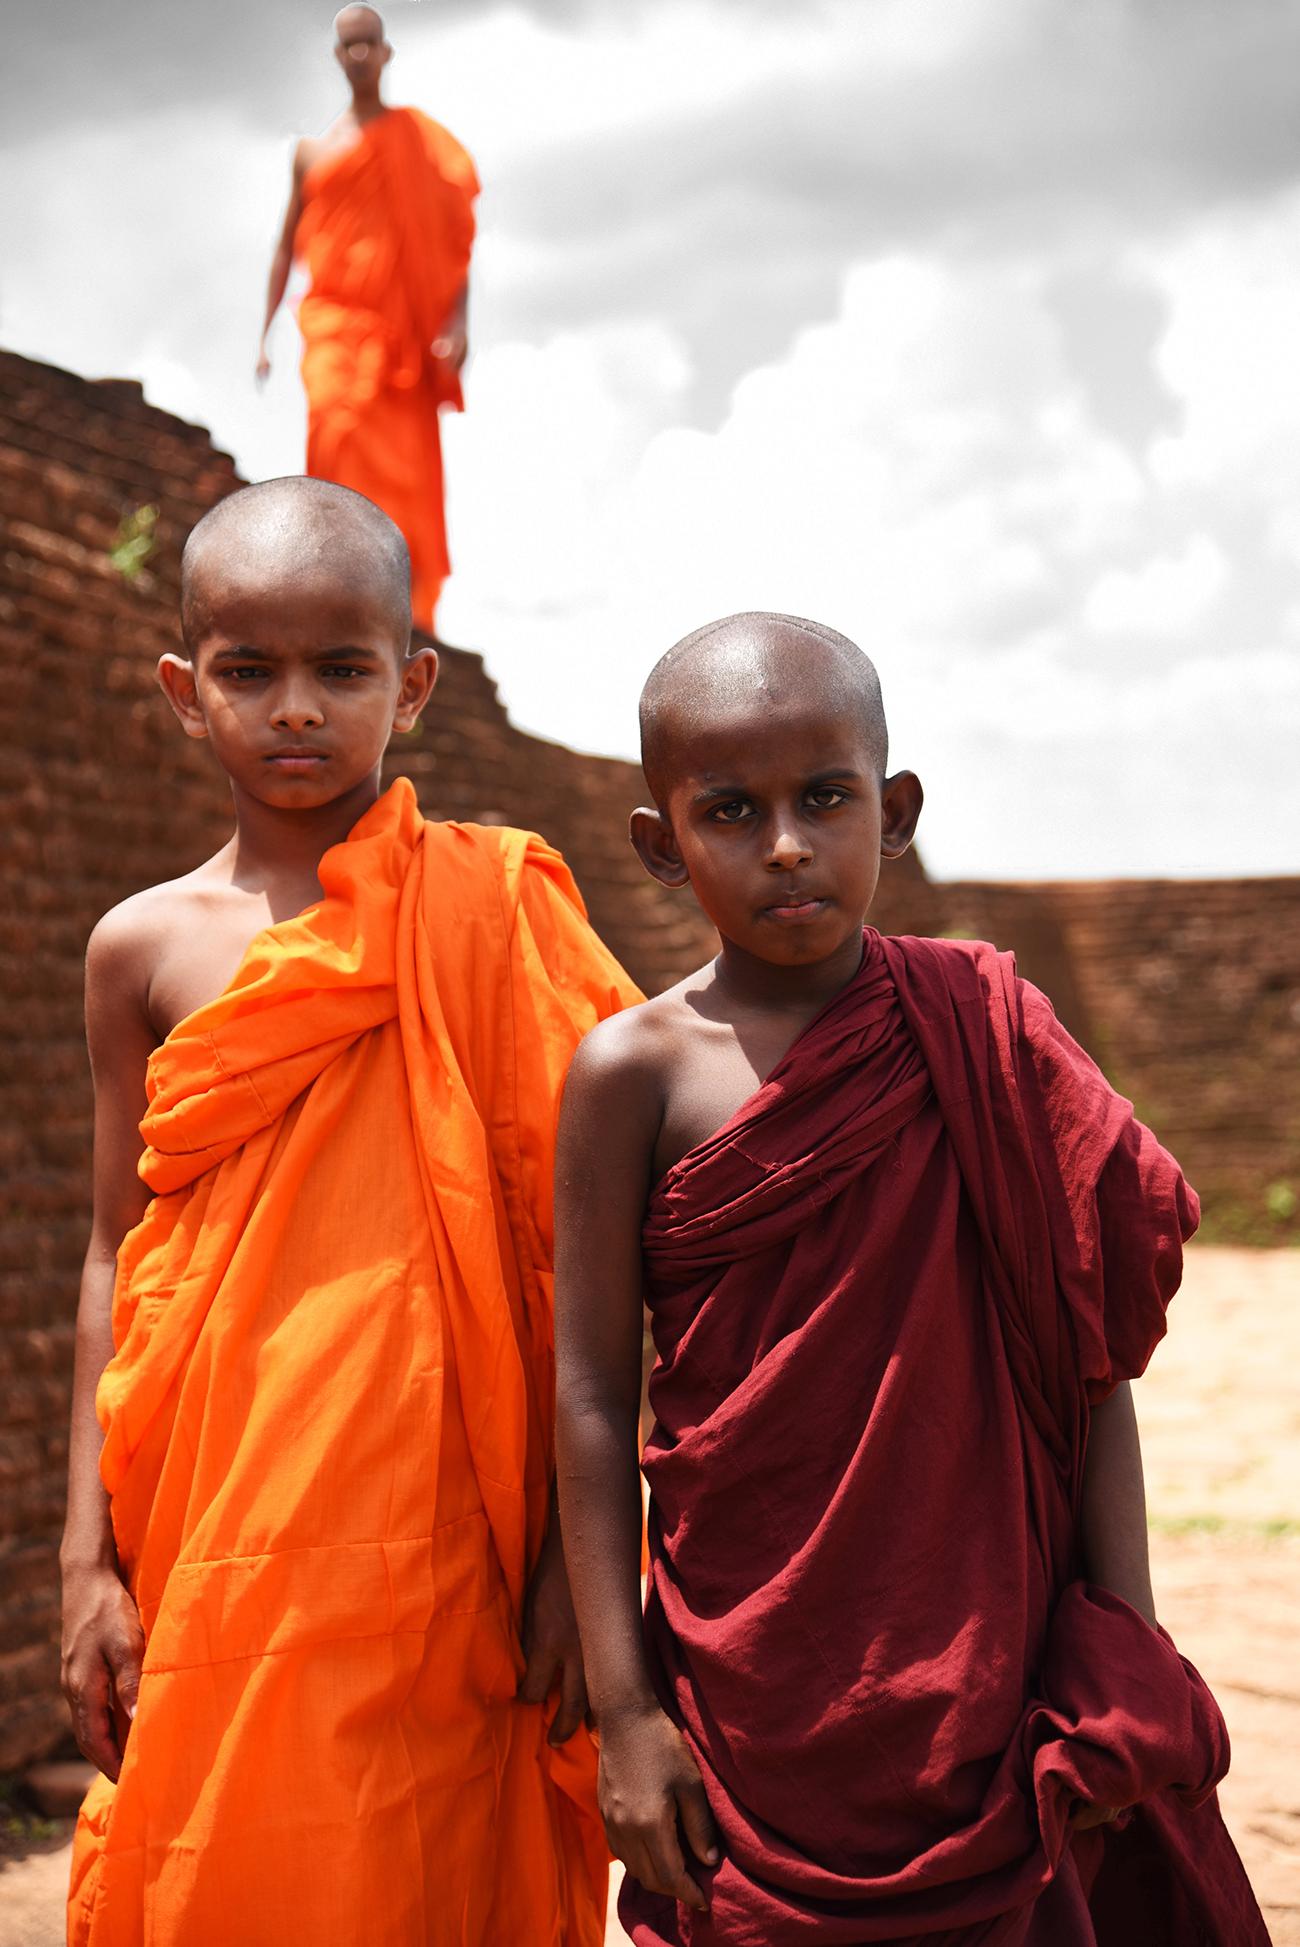 srilanka_monks_15